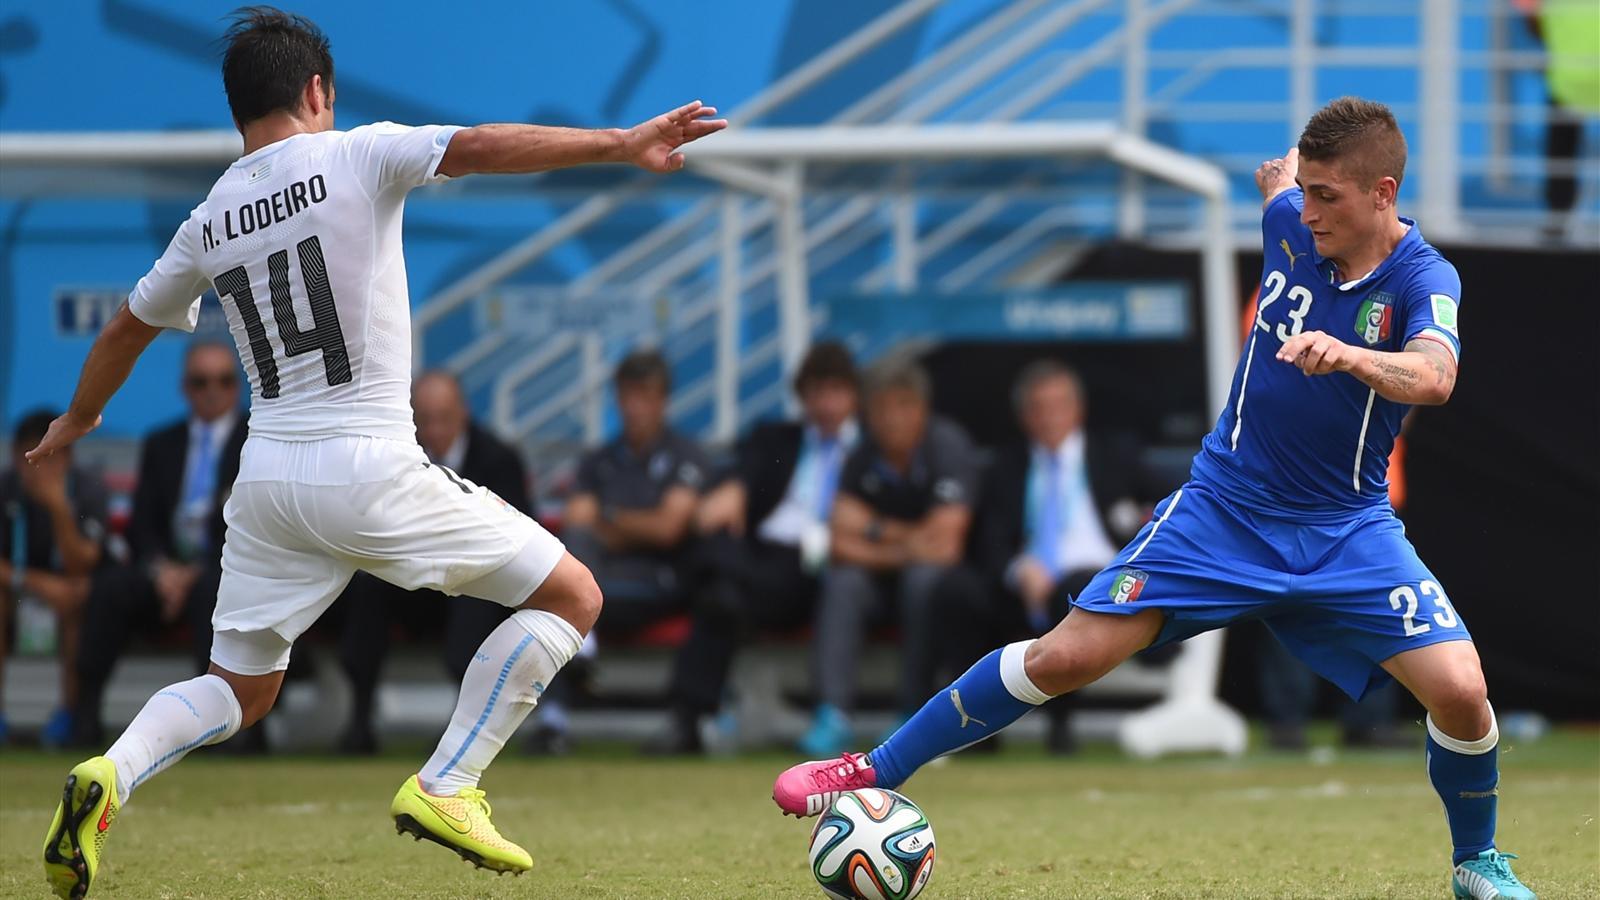 un match amical italie uruguay nice en juin football eurosport. Black Bedroom Furniture Sets. Home Design Ideas